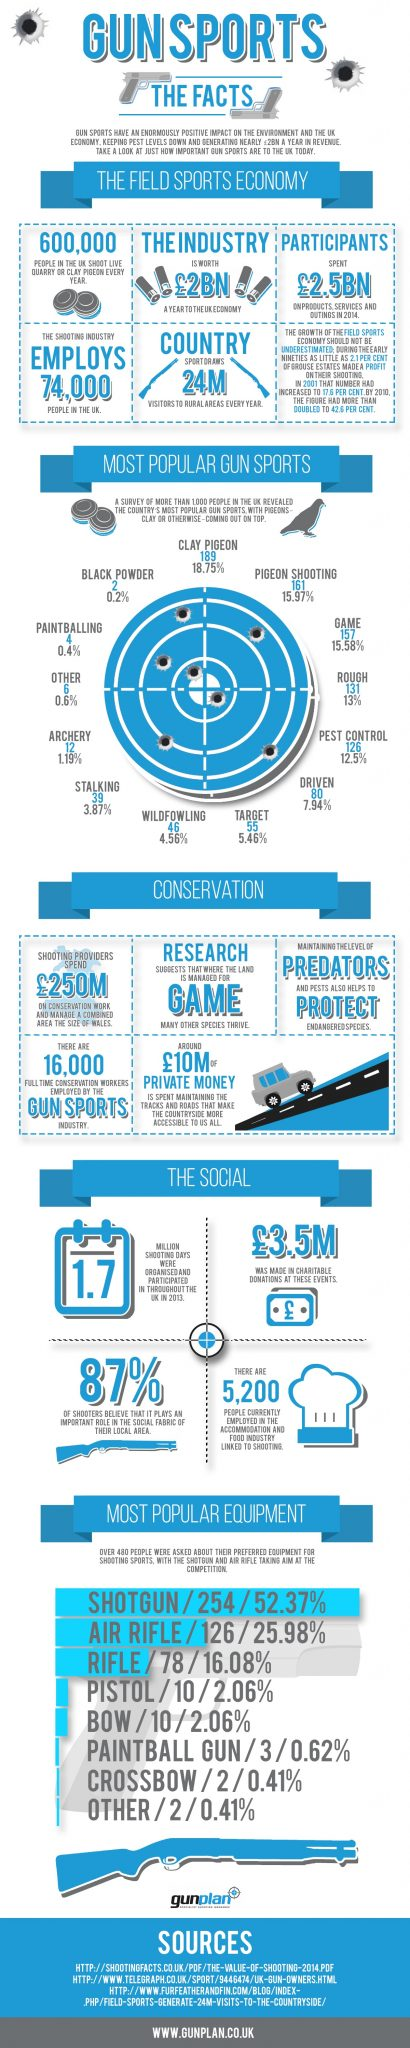 JRW Gun plan infographic FINAL2